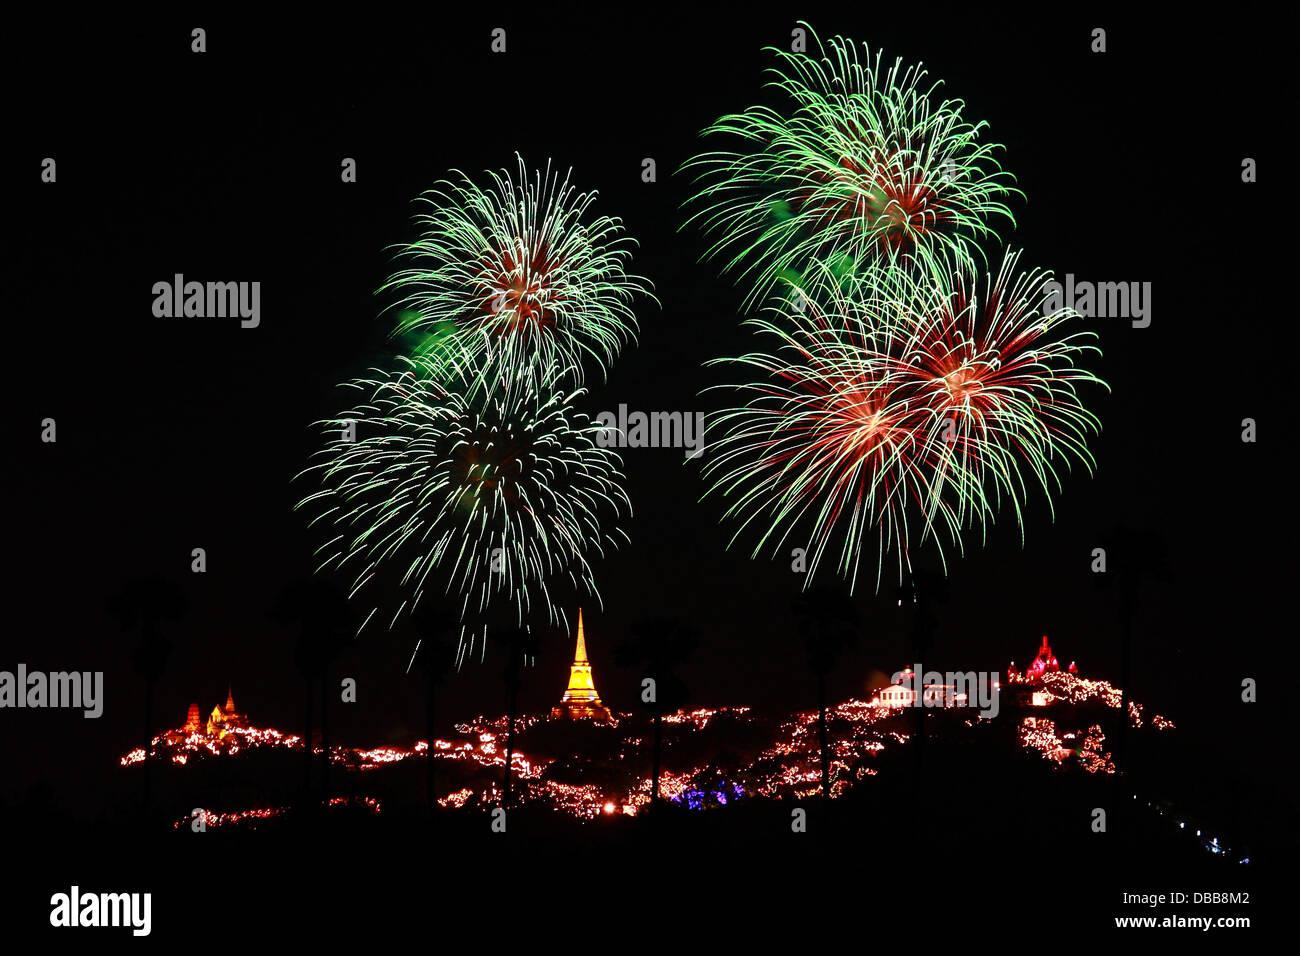 Khao Wang Festival with Firework on Khao Wang Mountain Palace in Phetchaburi, Thailand - Stock Image